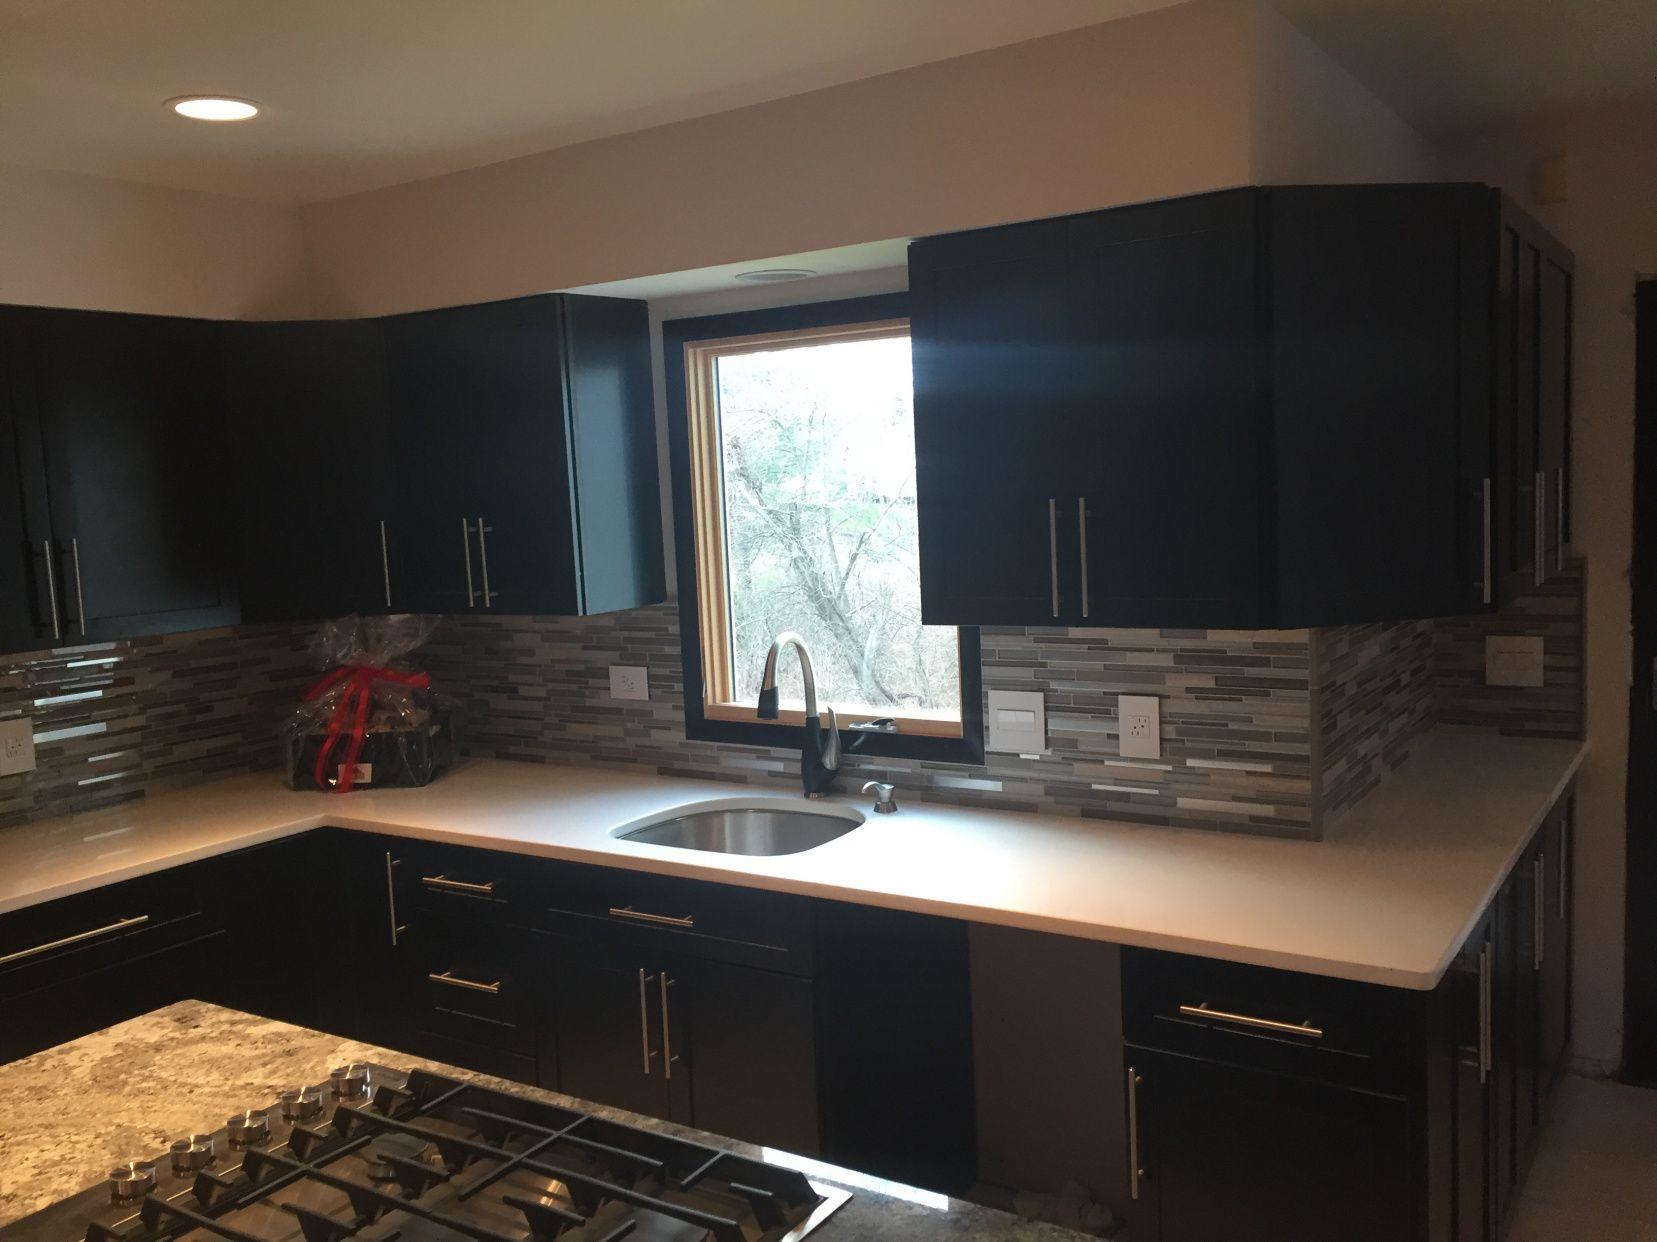 2018 Quartz Countertops Orange County   Kitchen Decor Theme Ideas Check  More At Http:/